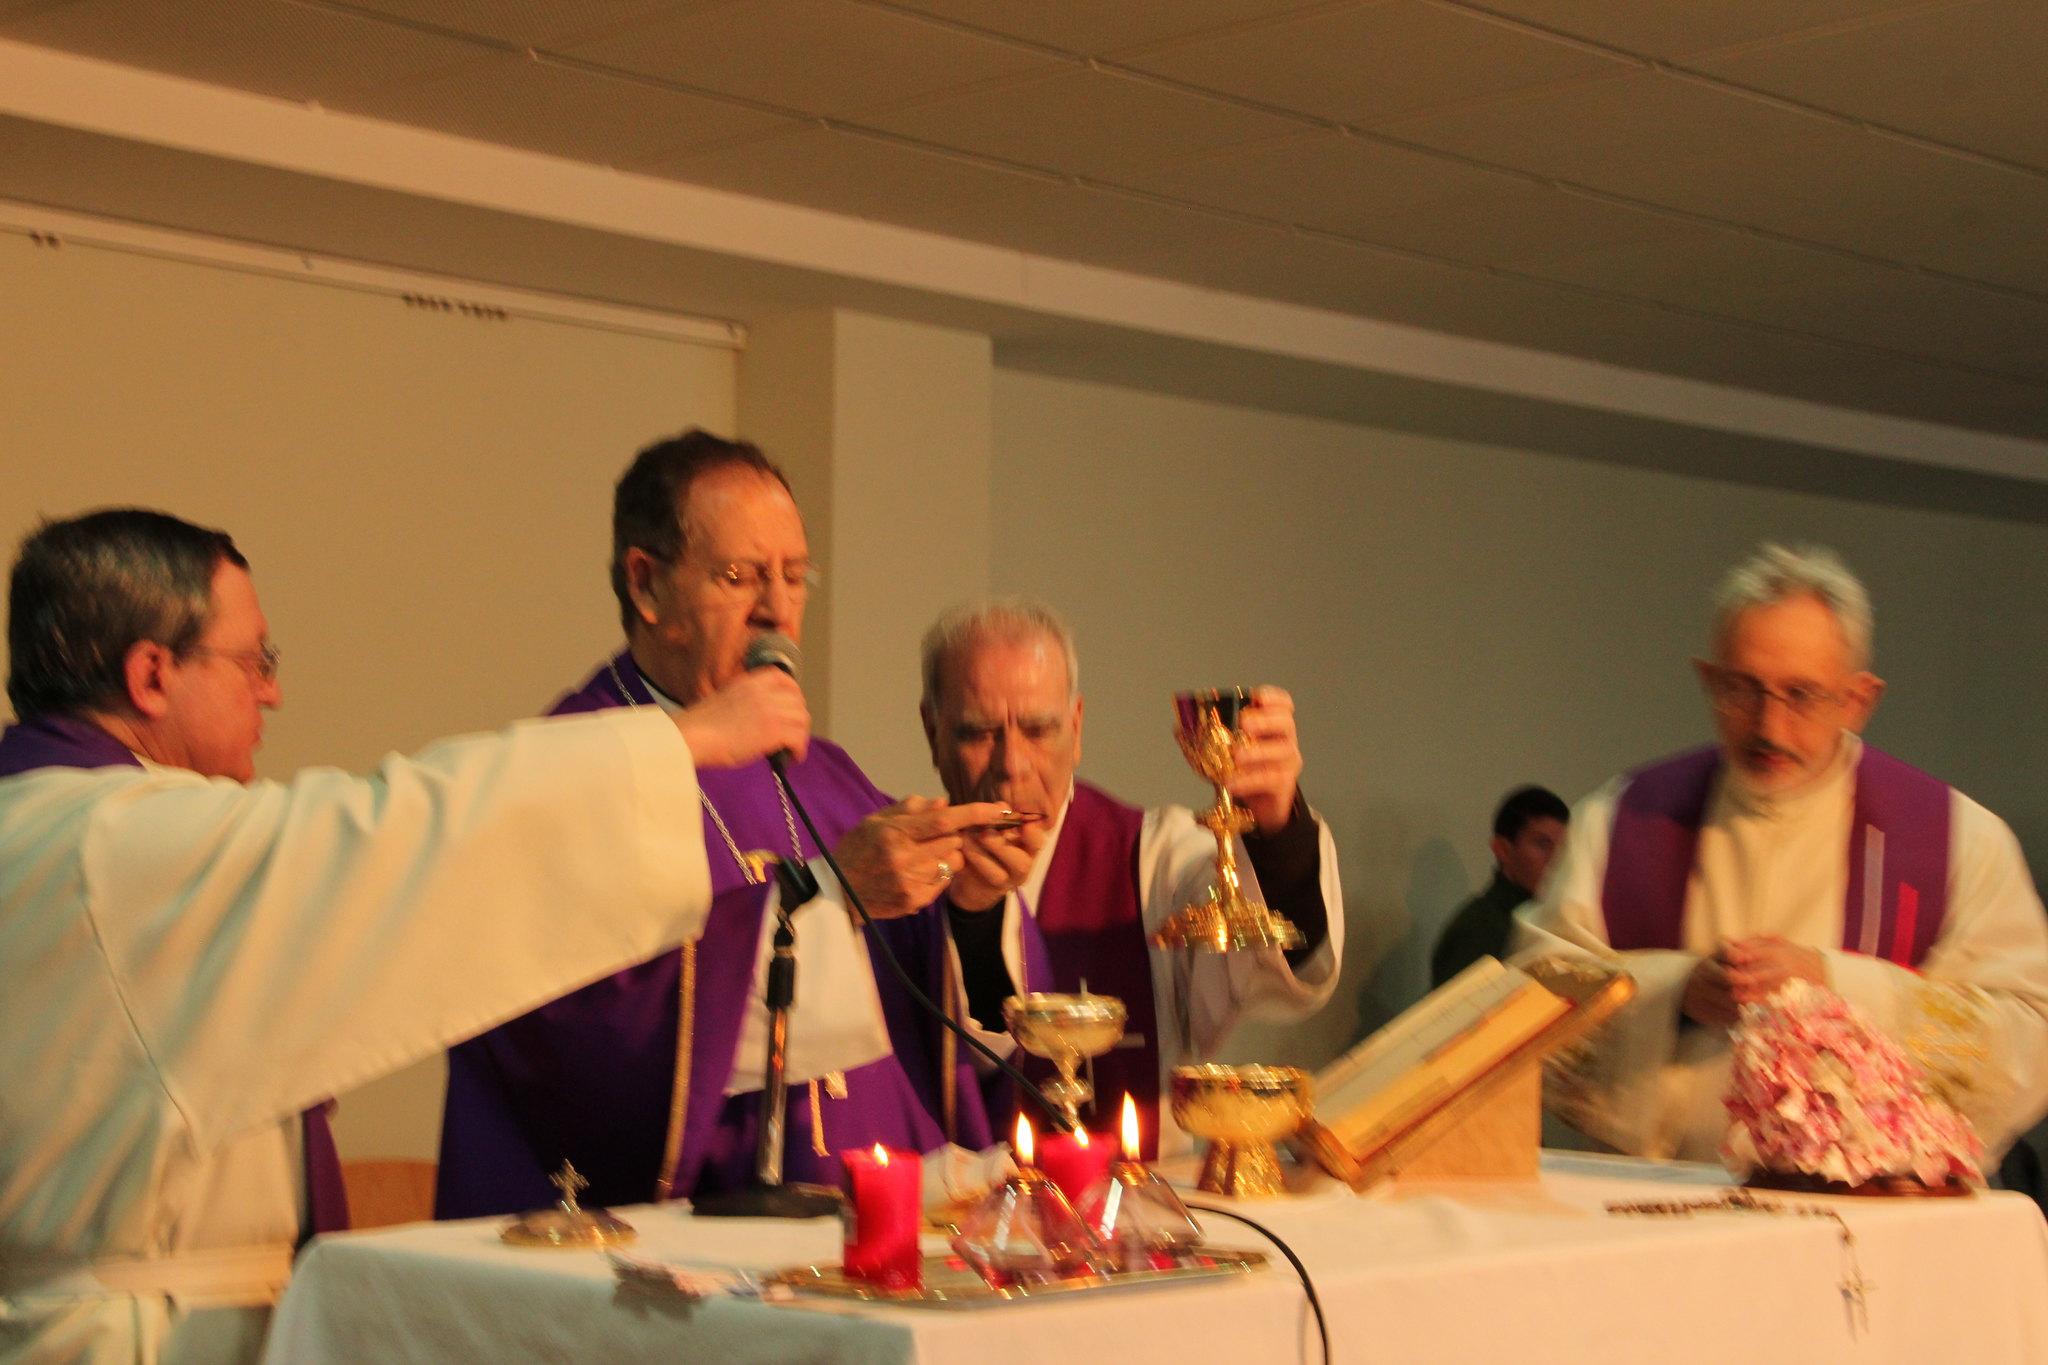 (2016-02-13) - Inauguración Virgen De Lourdes, La Molineta - Archivo La Molineta (048)